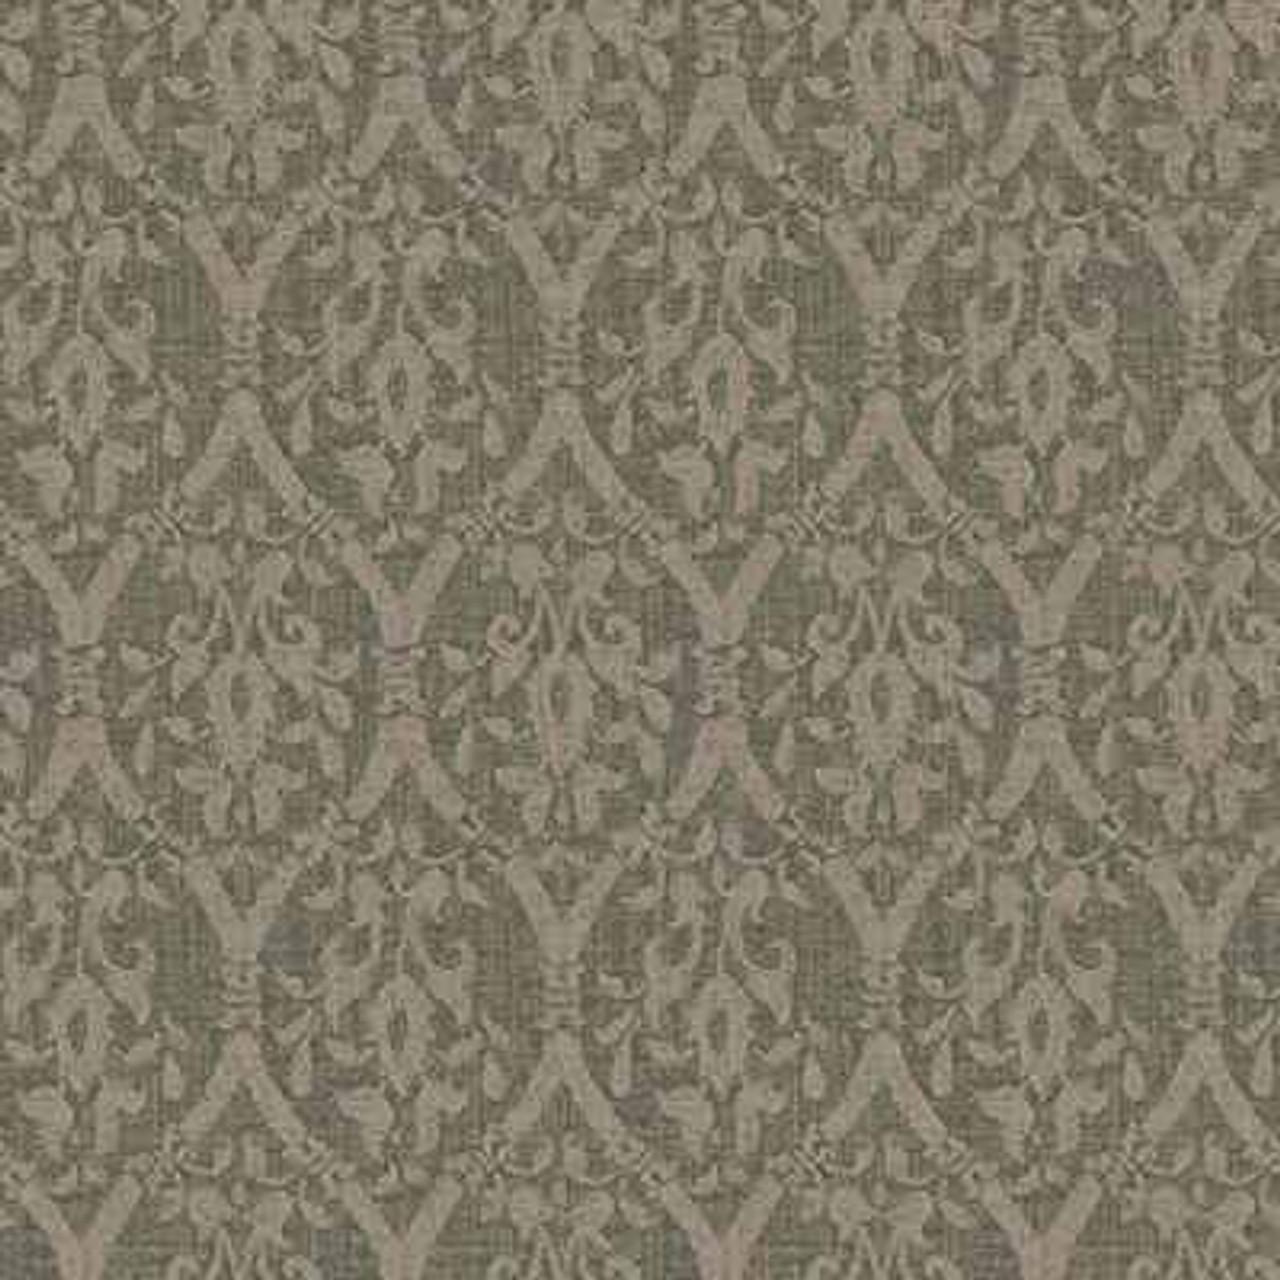 WestPoint/Martex Martex Rx or Comforter or Bennet or Green